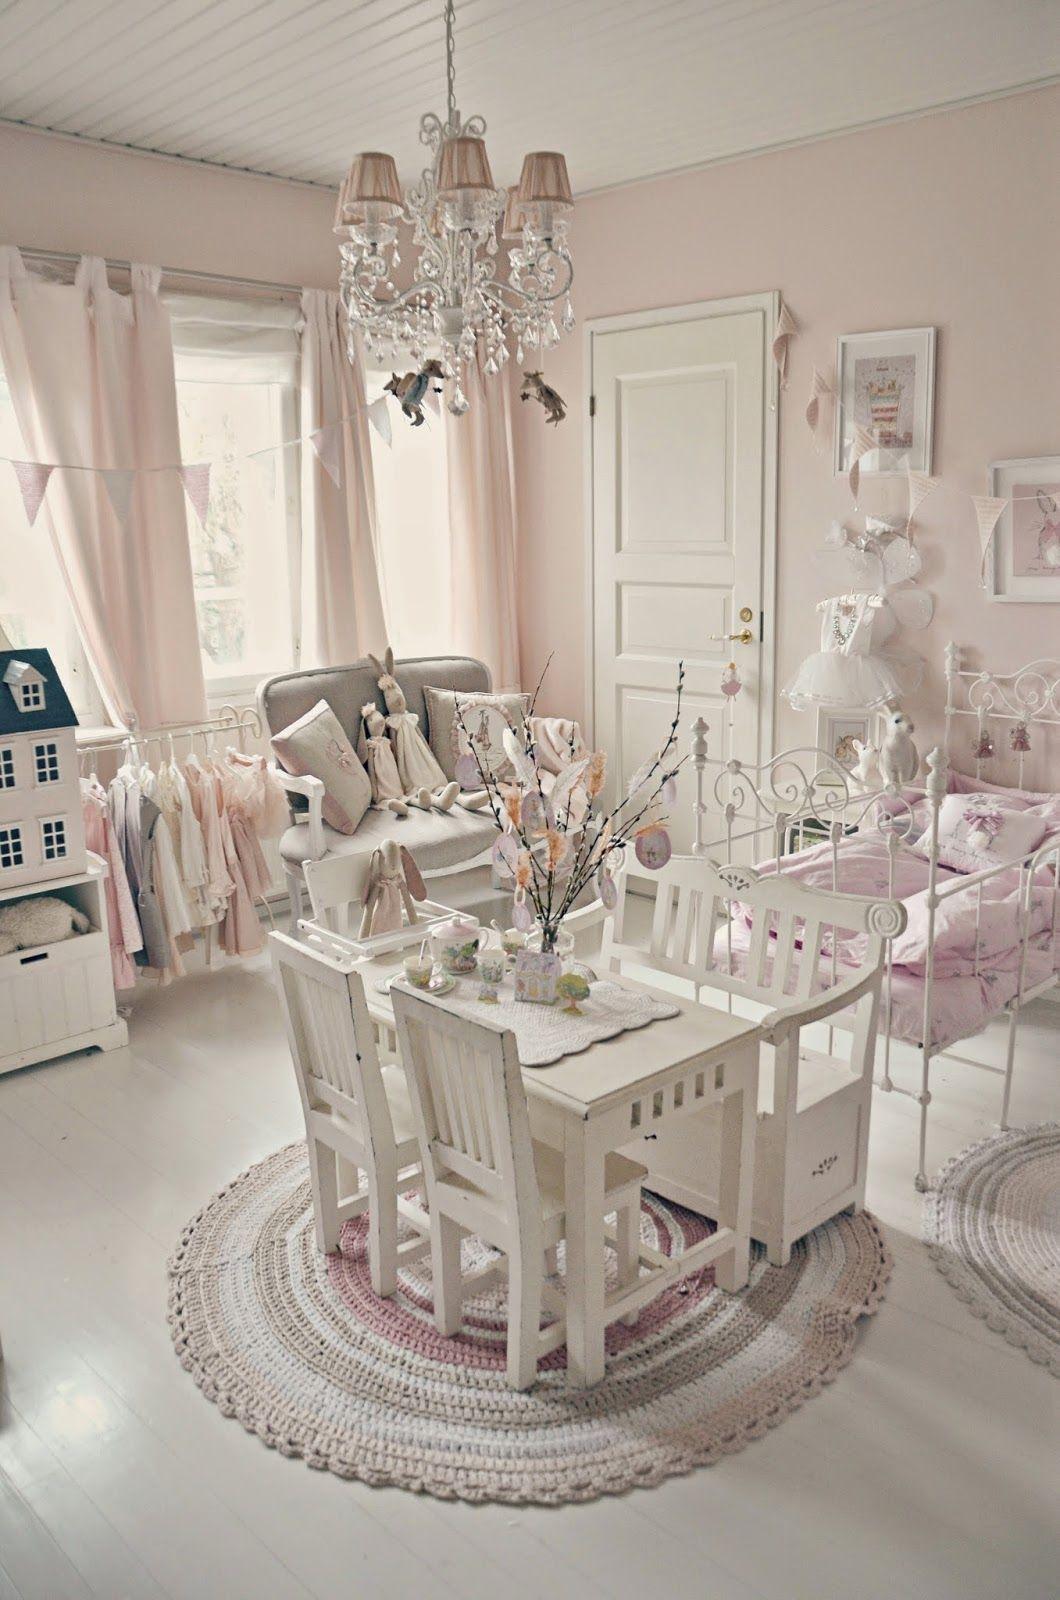 Kaunis Pieni Elama The Perfect Girl S Room Shabby Chic Room